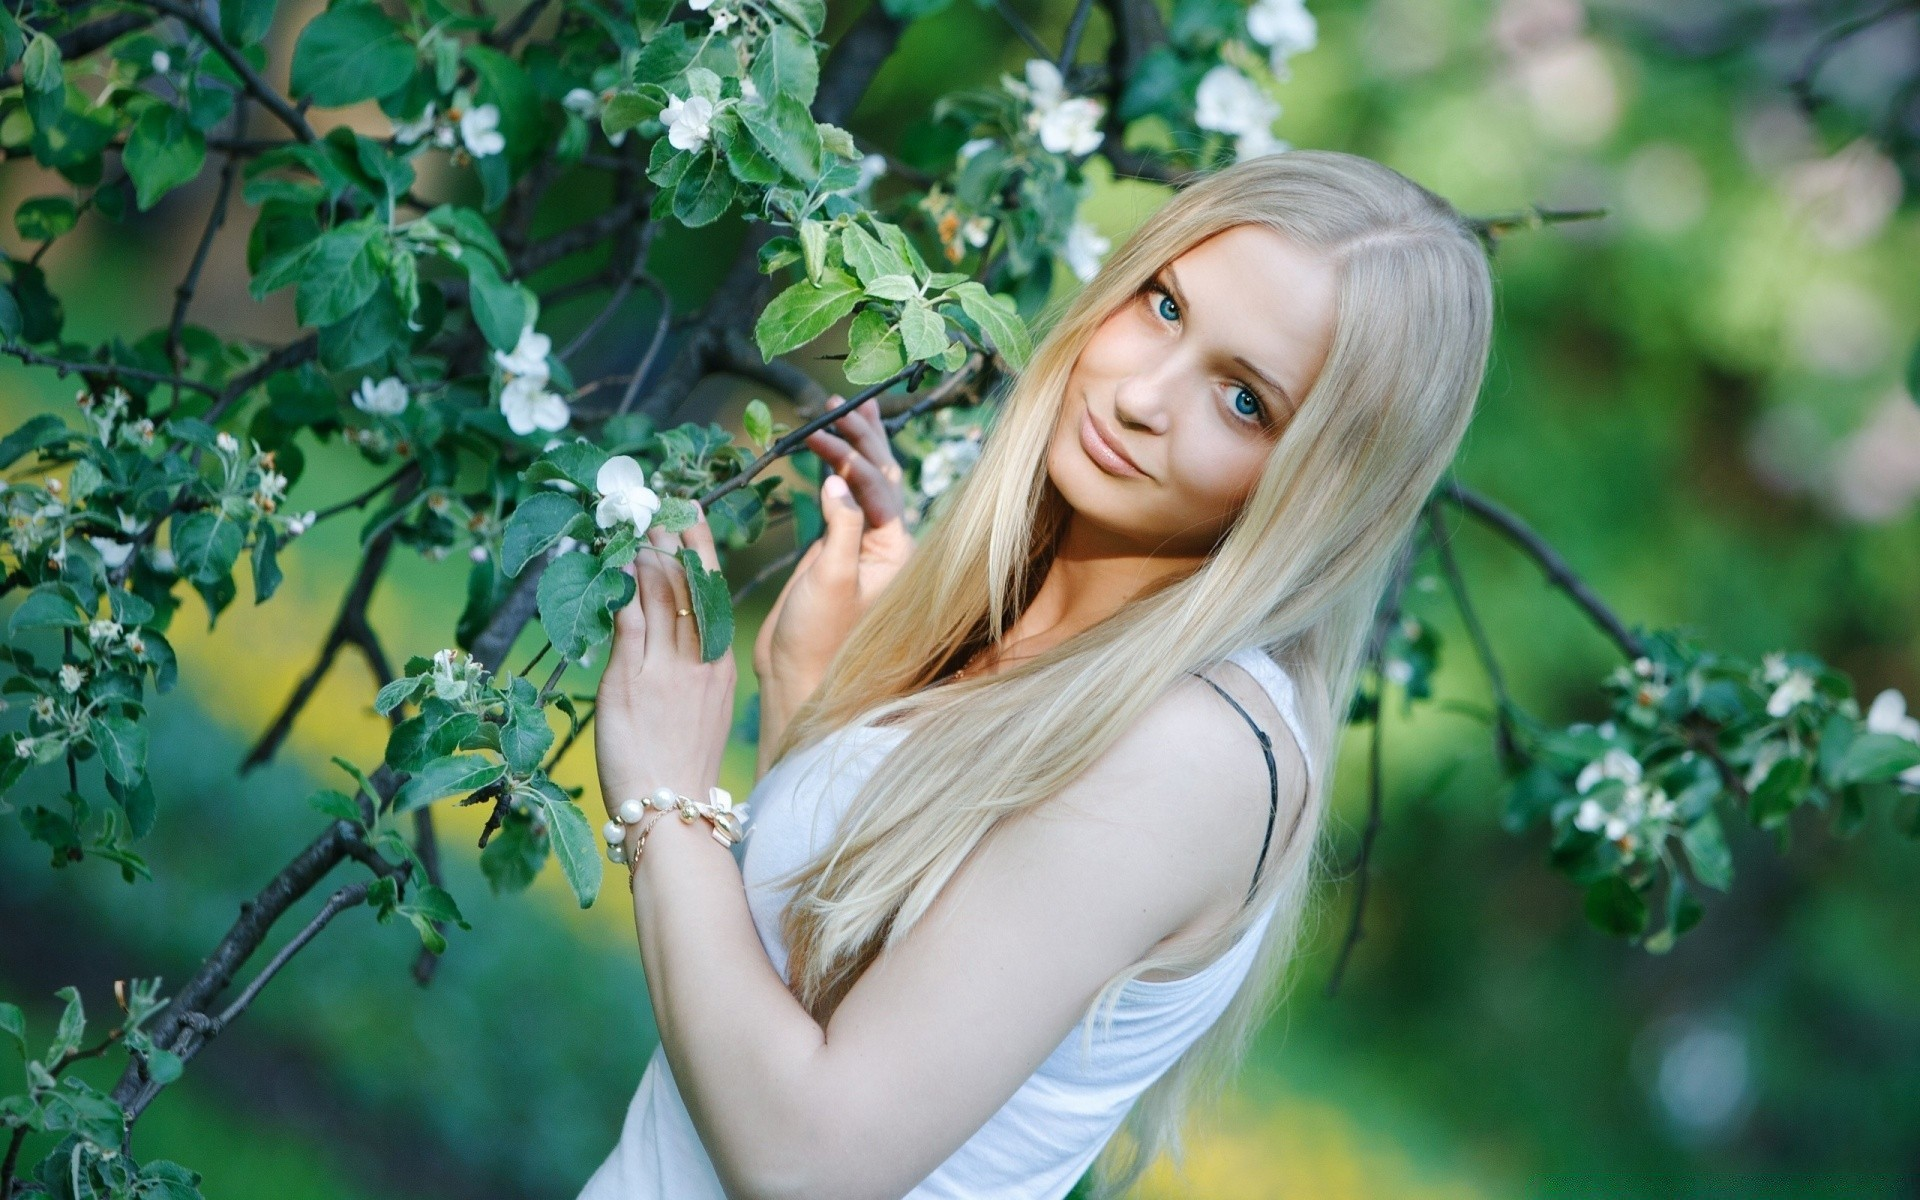 Фото домашнее красив голых жен темную бархатную